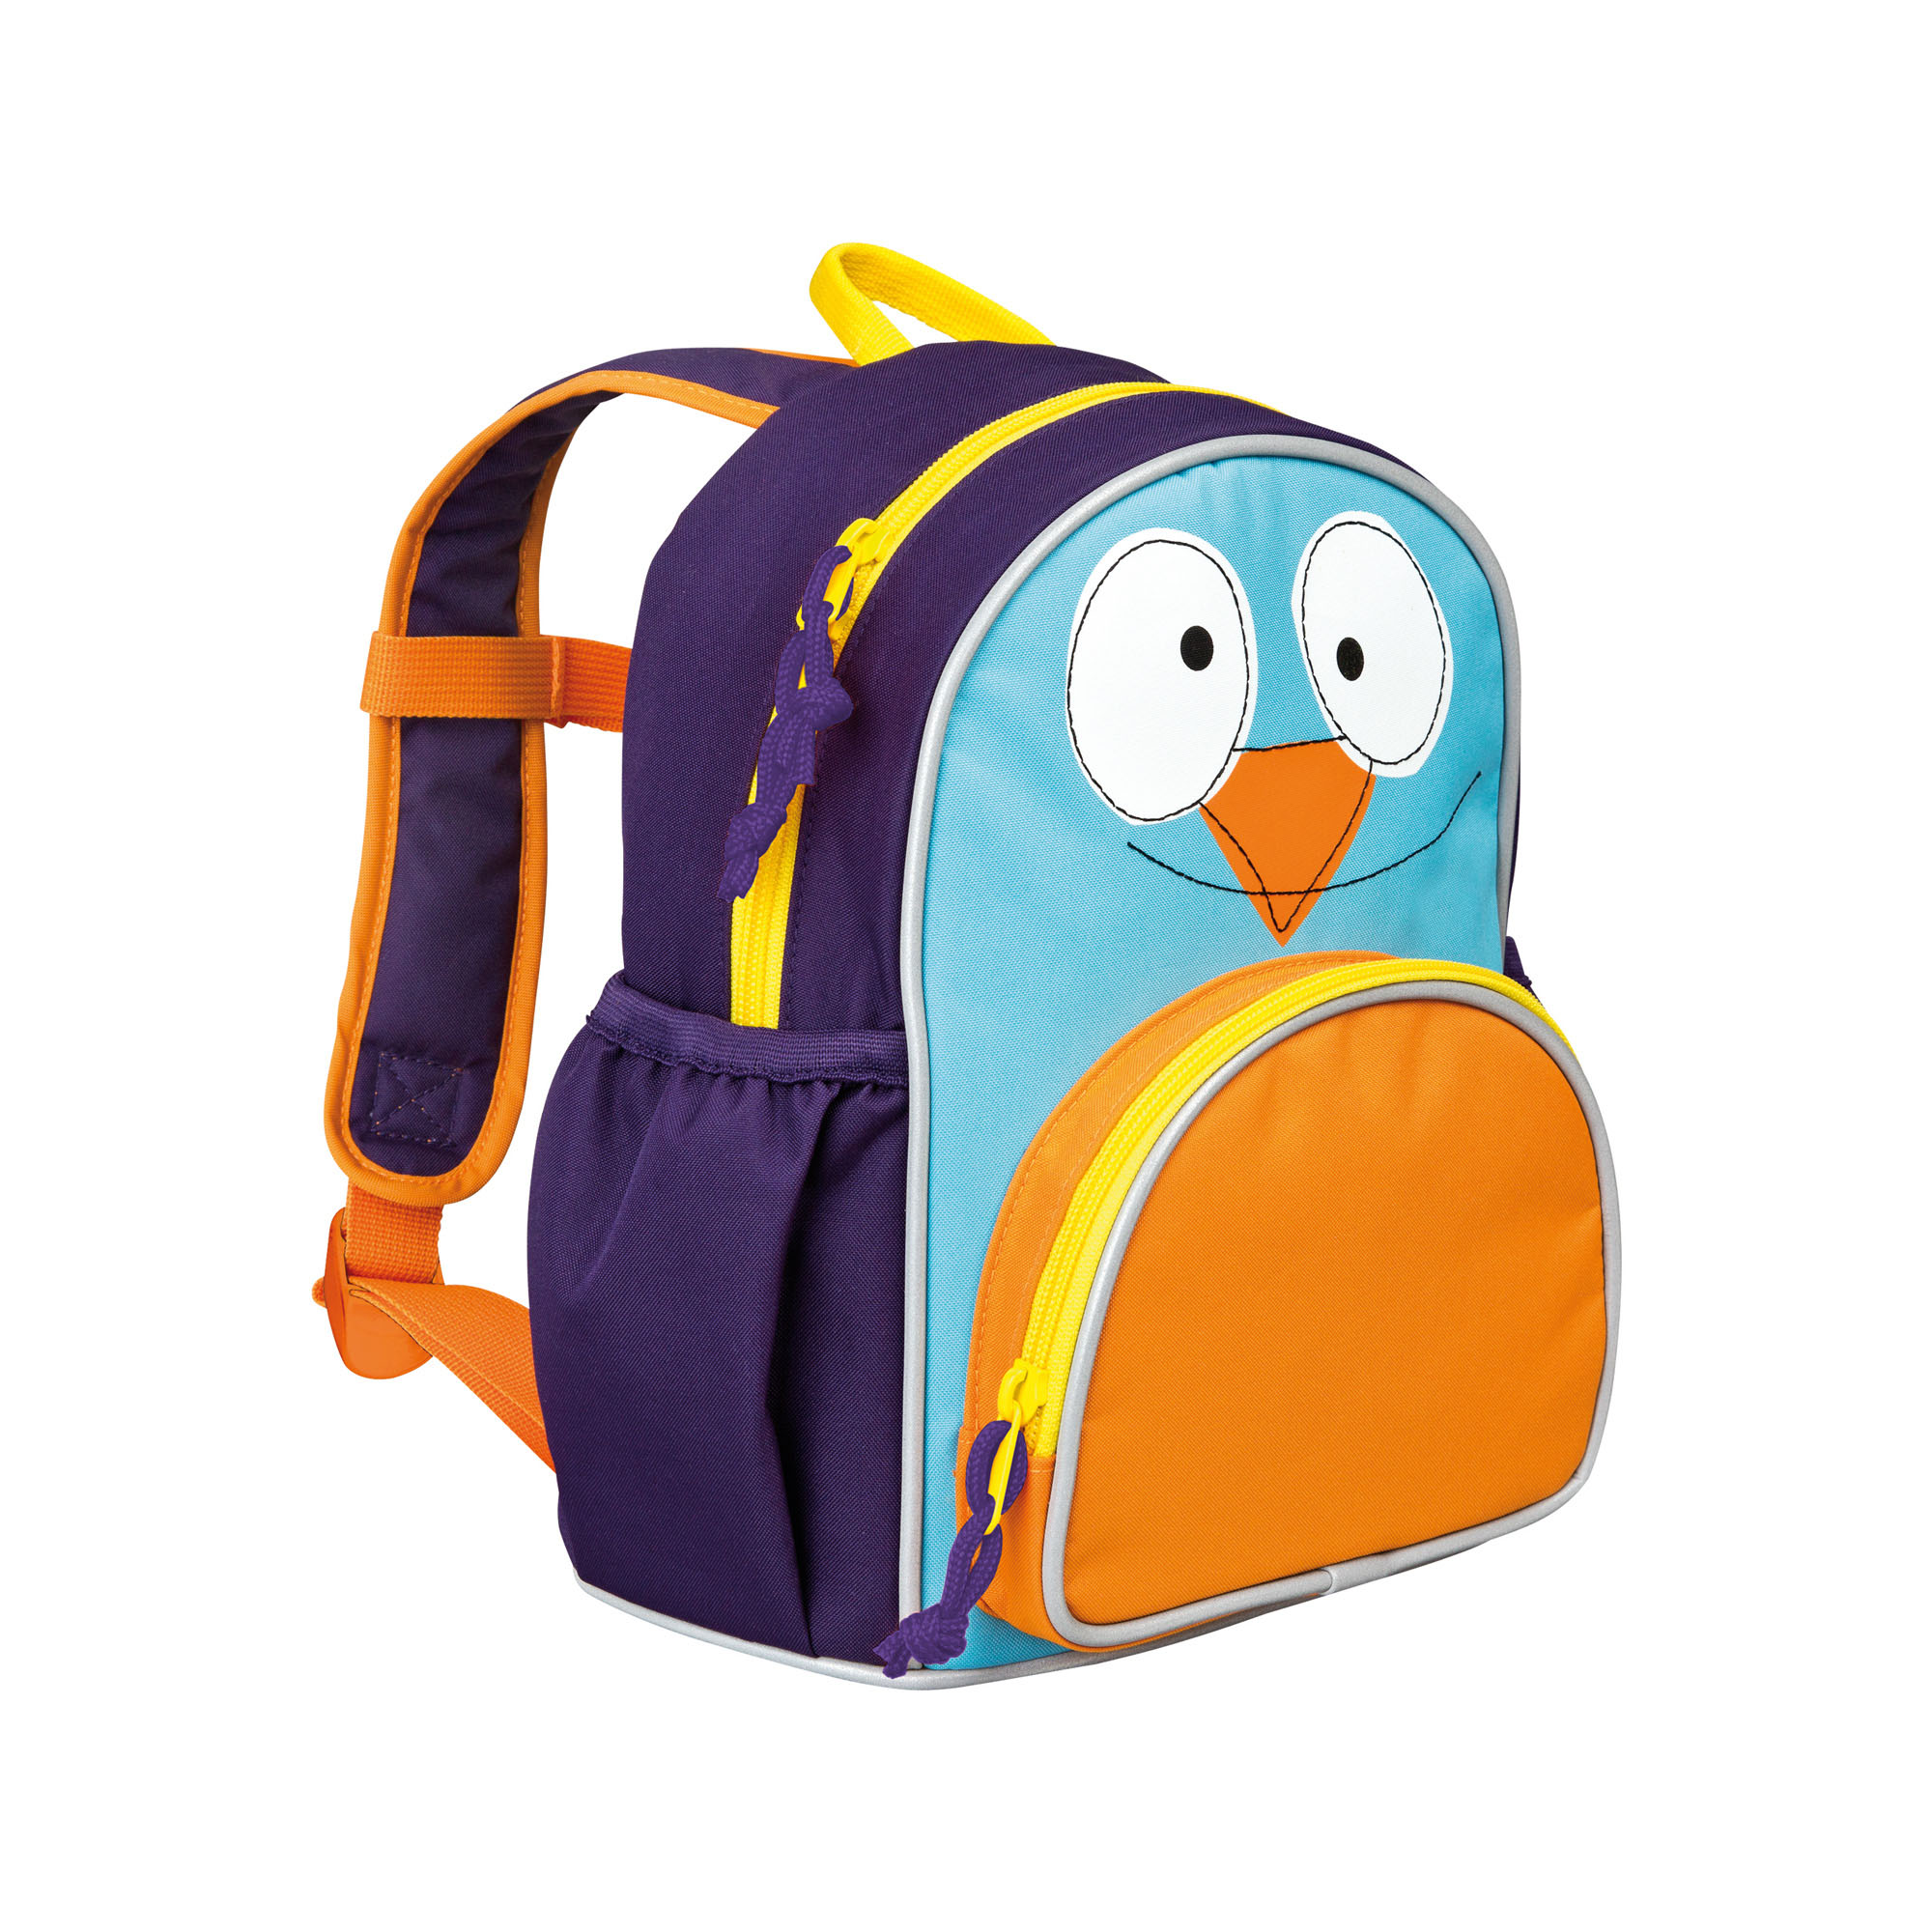 Laessig mini update wildlife τσάντα πλάτης